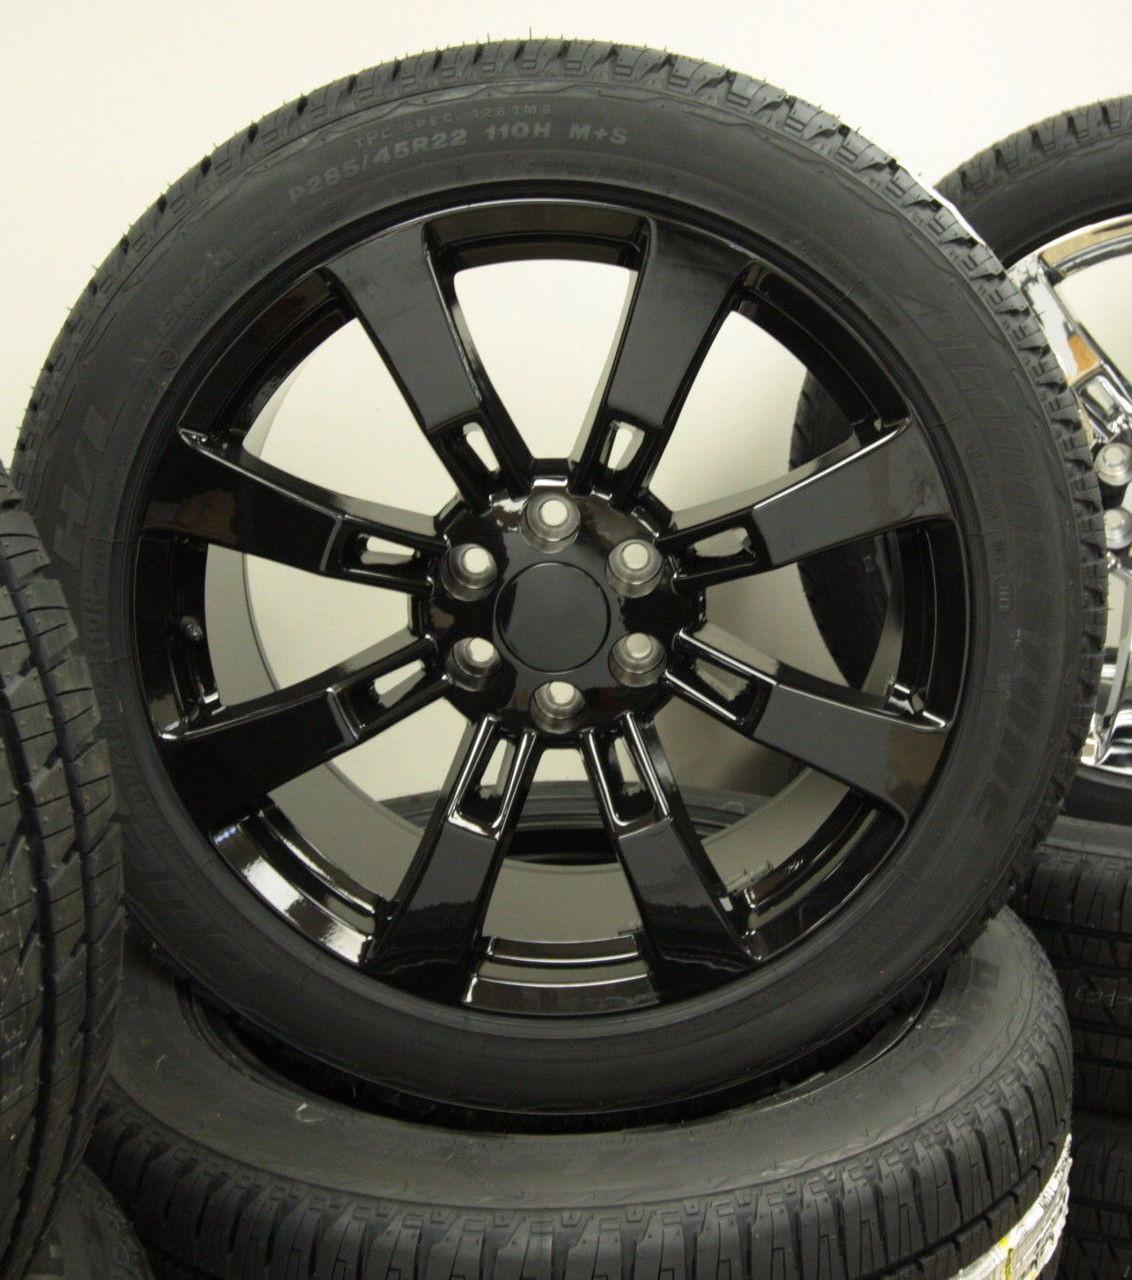 "Gloss Black 22"" Eight Spoke Wheels with Bridgestone Tires for Chevy Silverado, Tahoe, Suburban - New Set of 4"